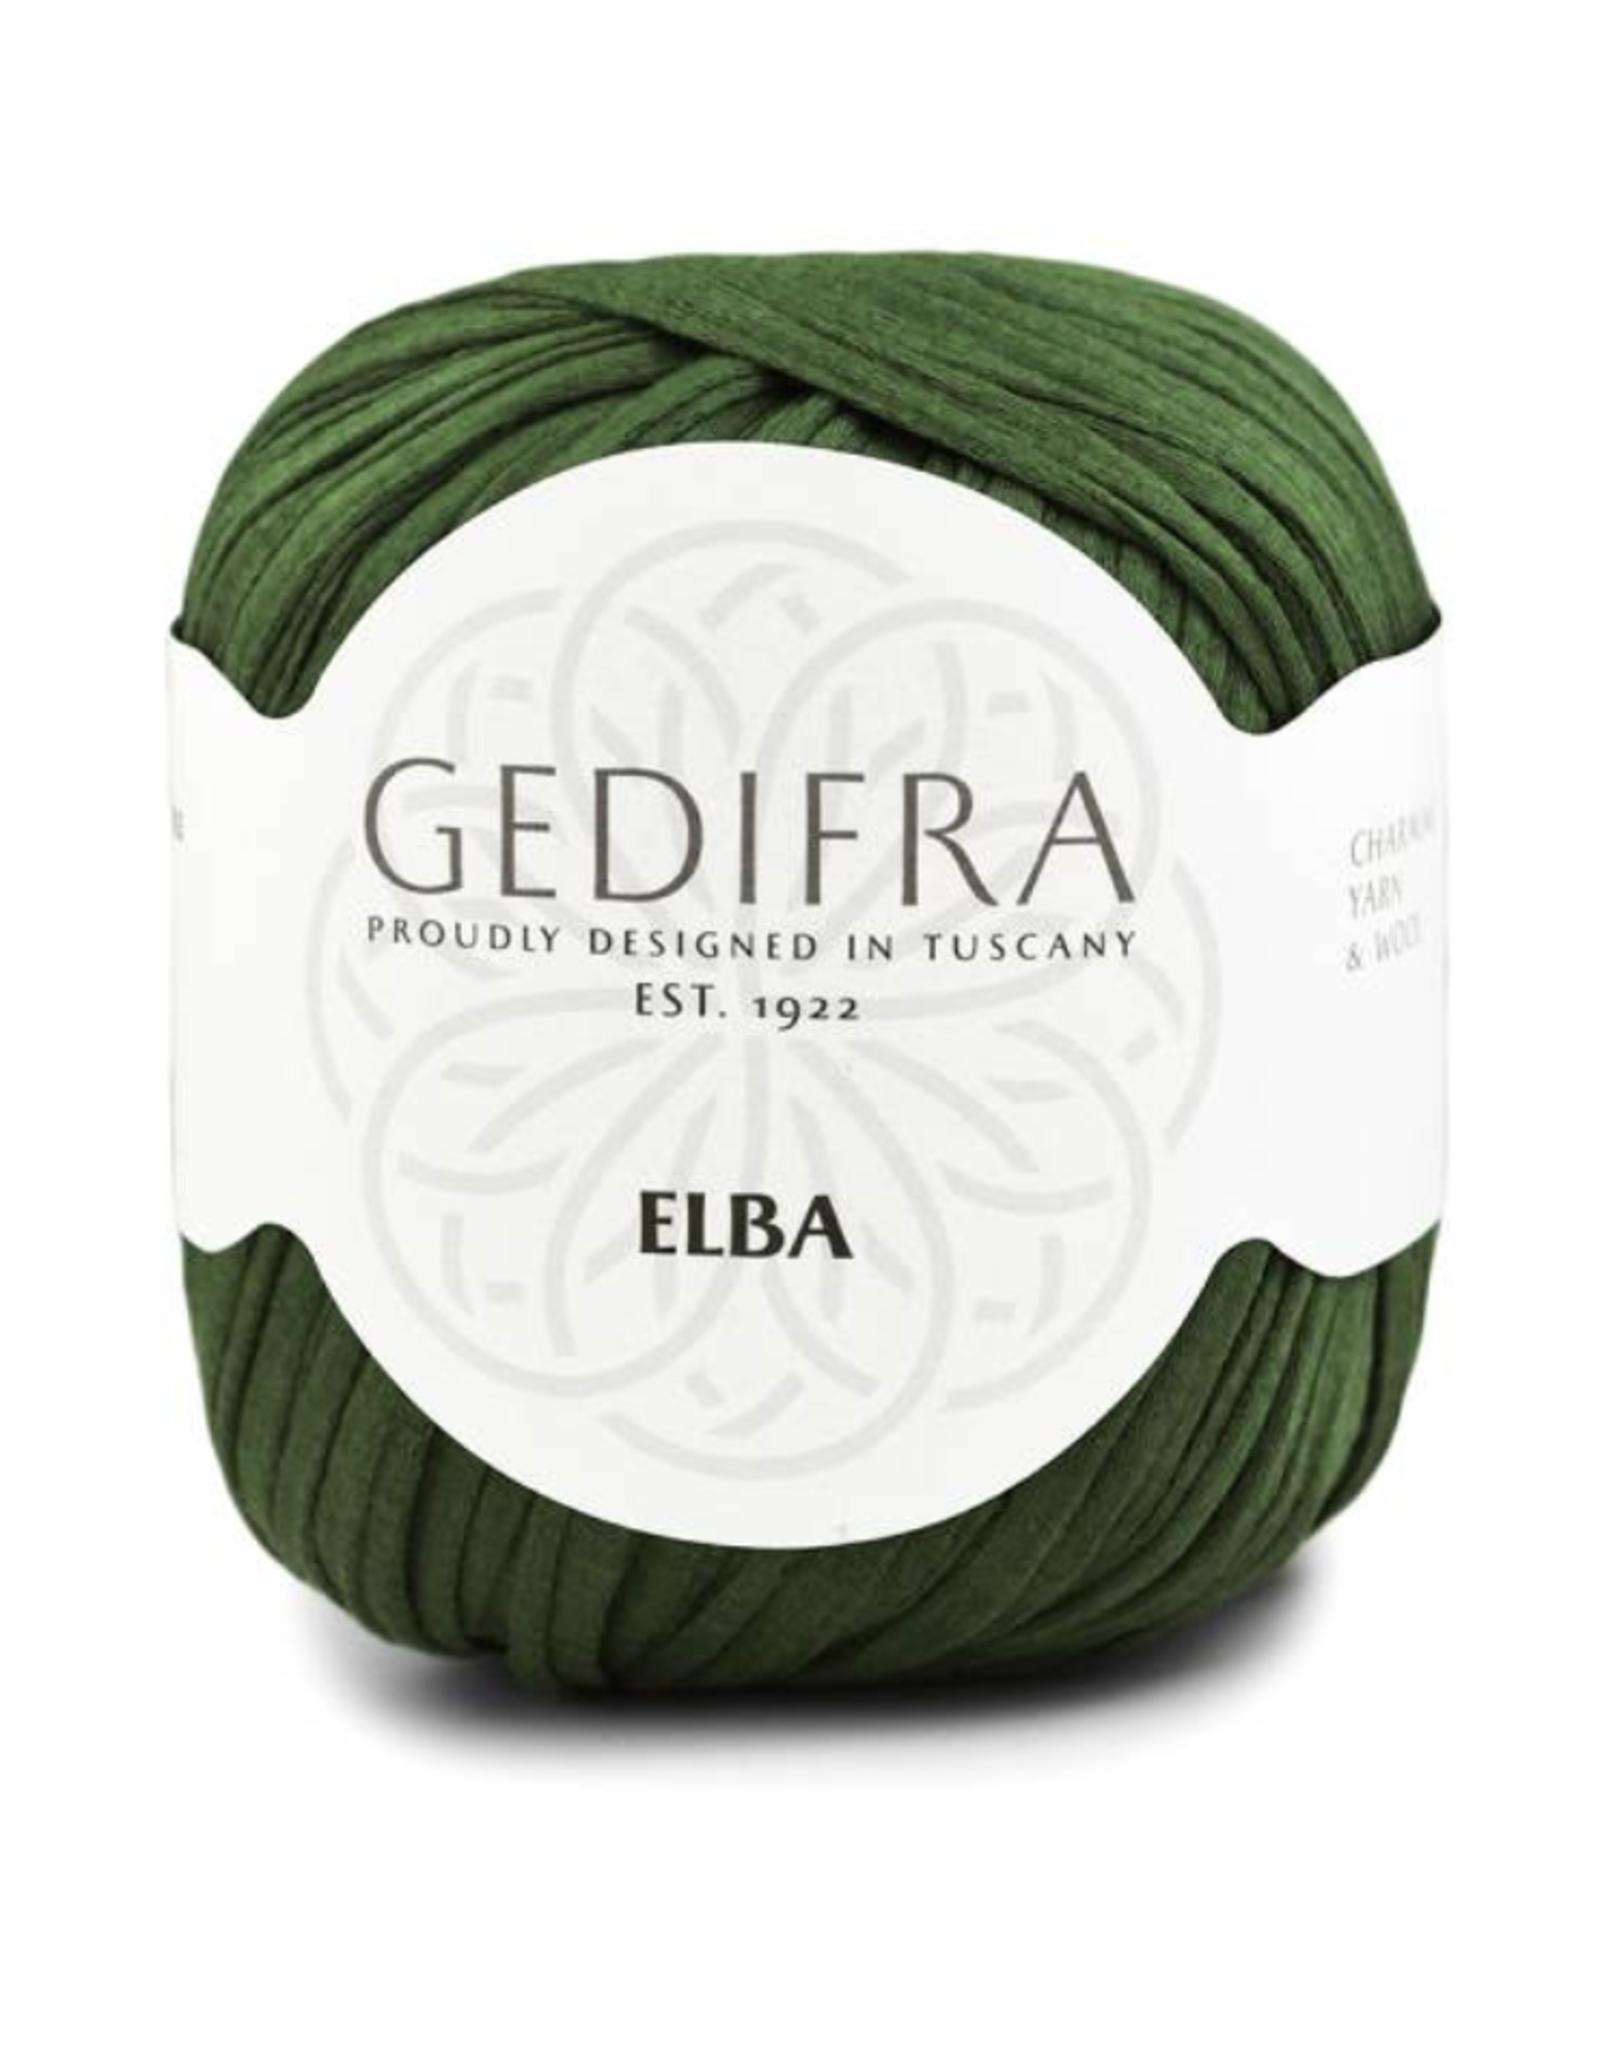 Gedifra Elba